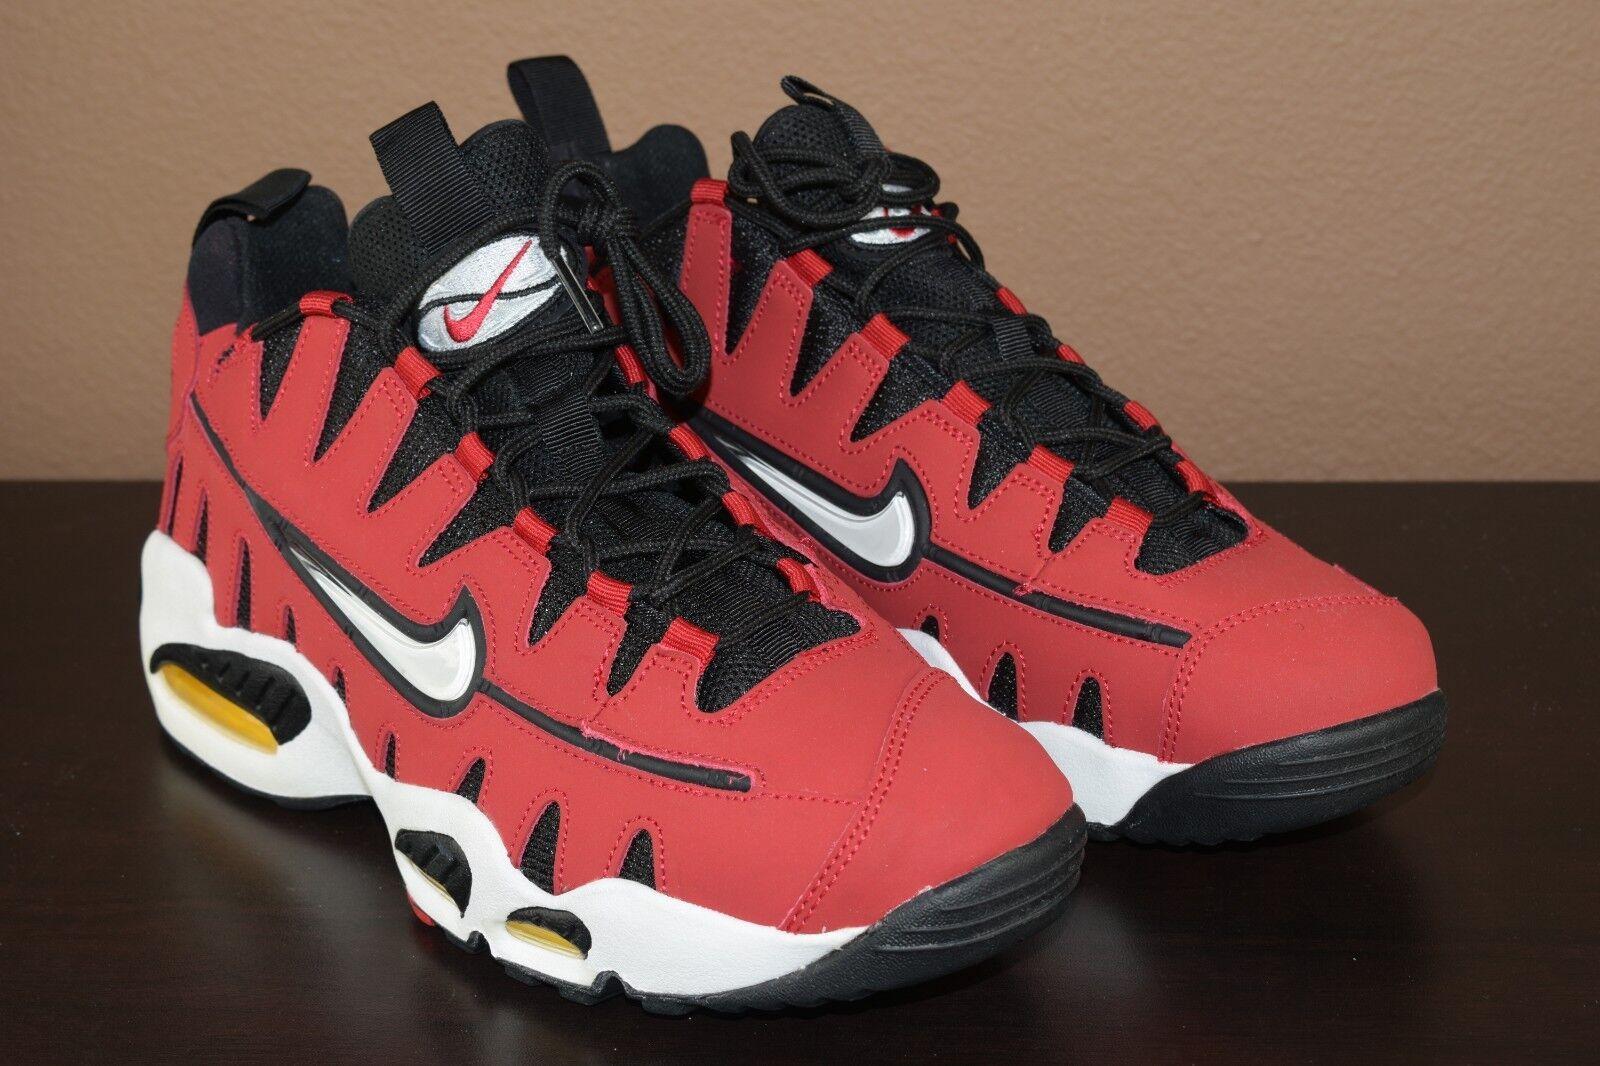 Nike Air Max NM Varsity Red Black Mesh Cutout Teeth 429749-600 Men's Size 11